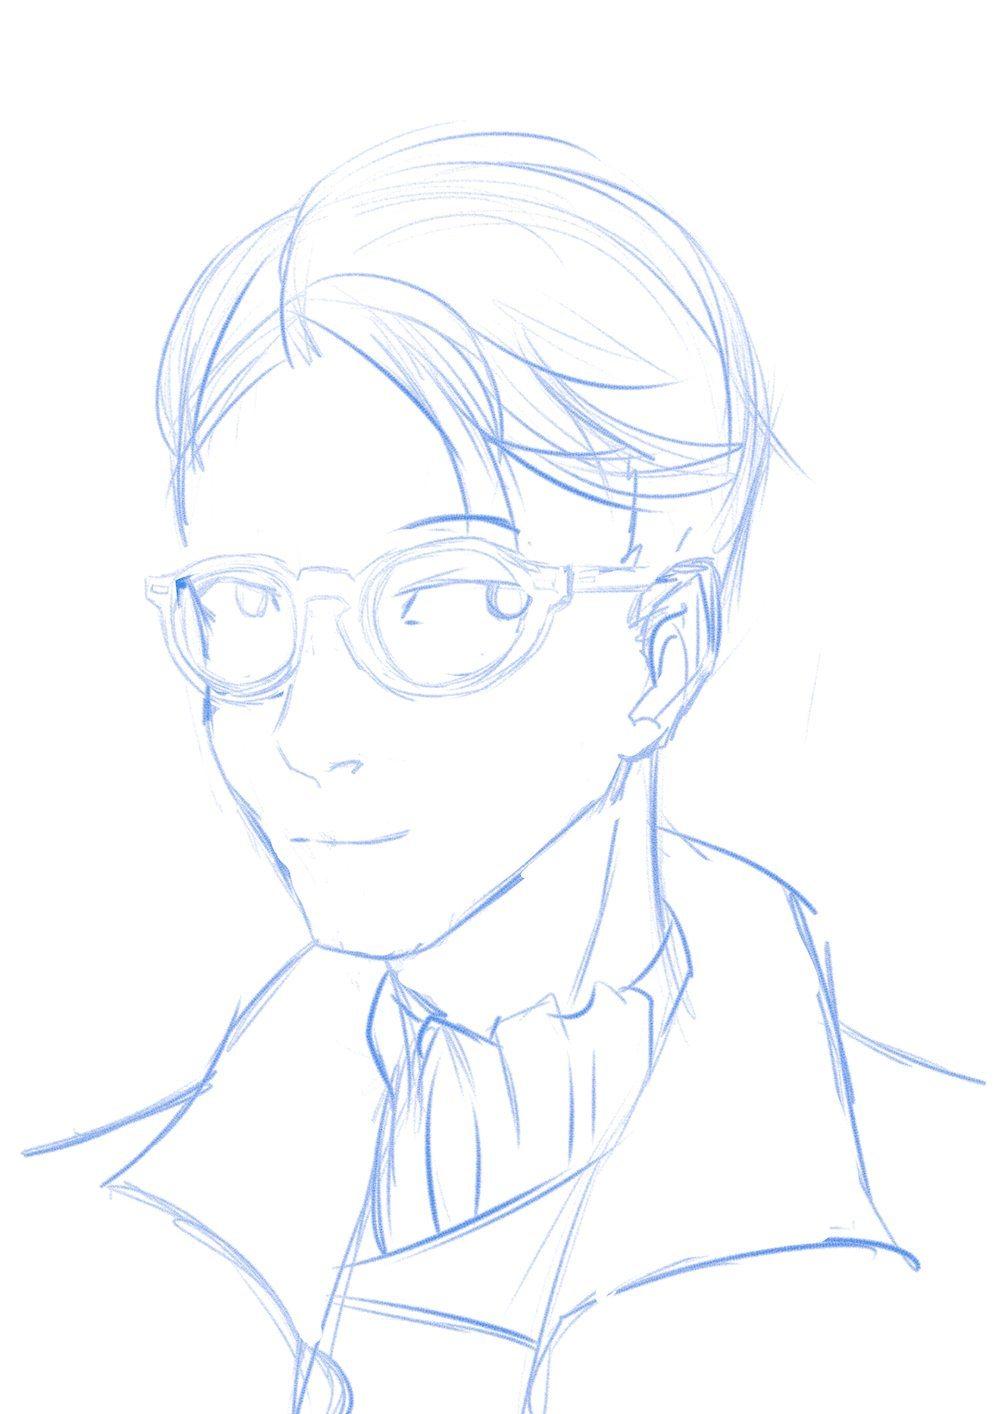 Updated Portrait Draft of Gretar by Jahvin Baxter